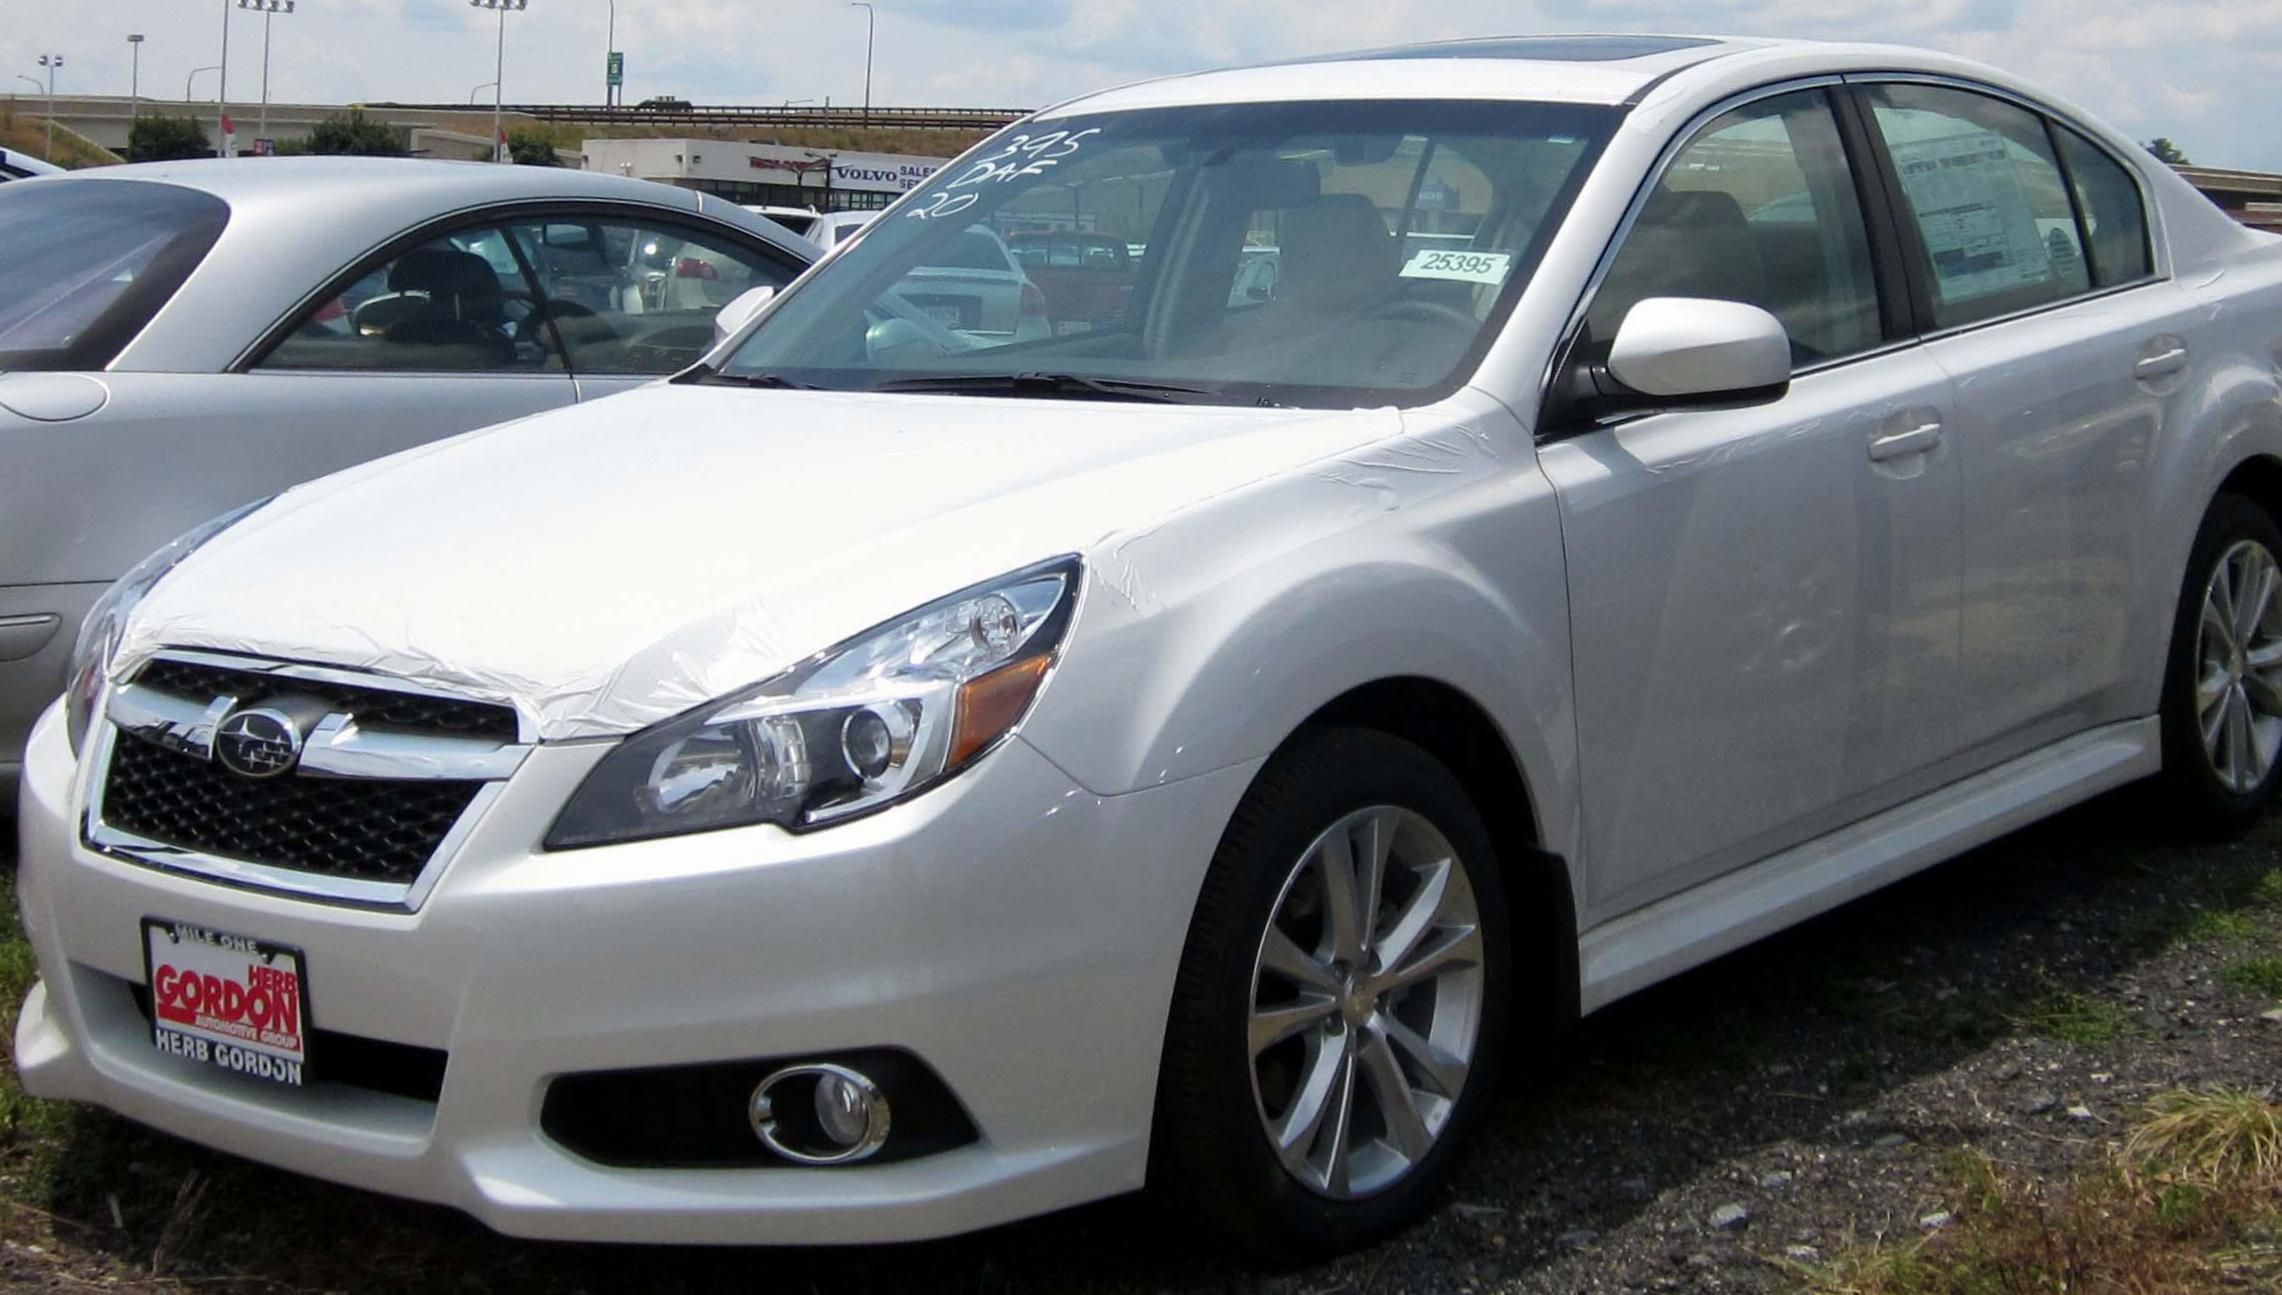 Subaru legacy black rims google search my legacy pinterest subaru legacy black rims and subaru